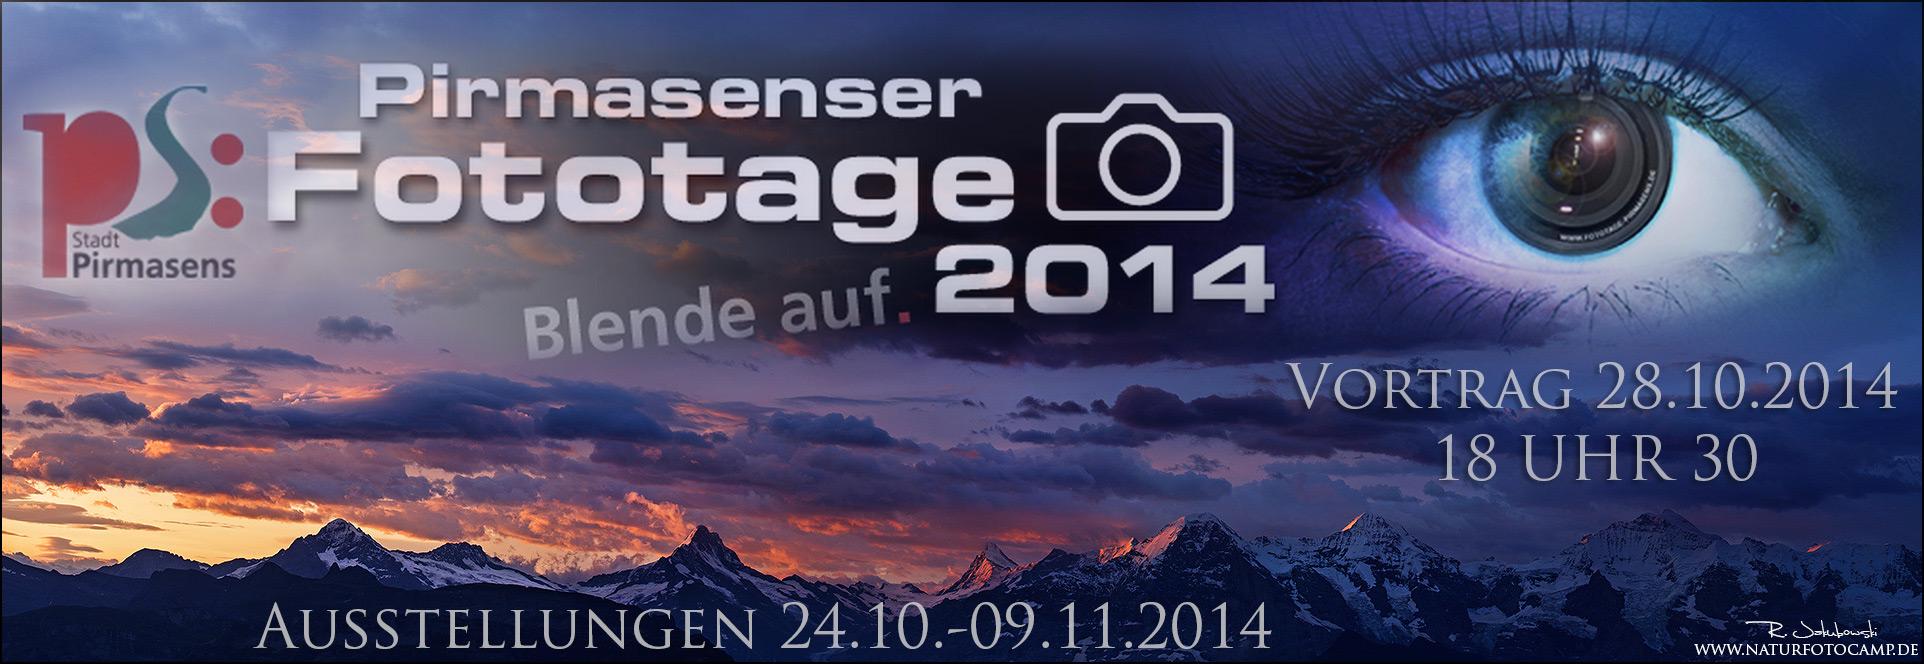 Pirmasenser Fototage 2014